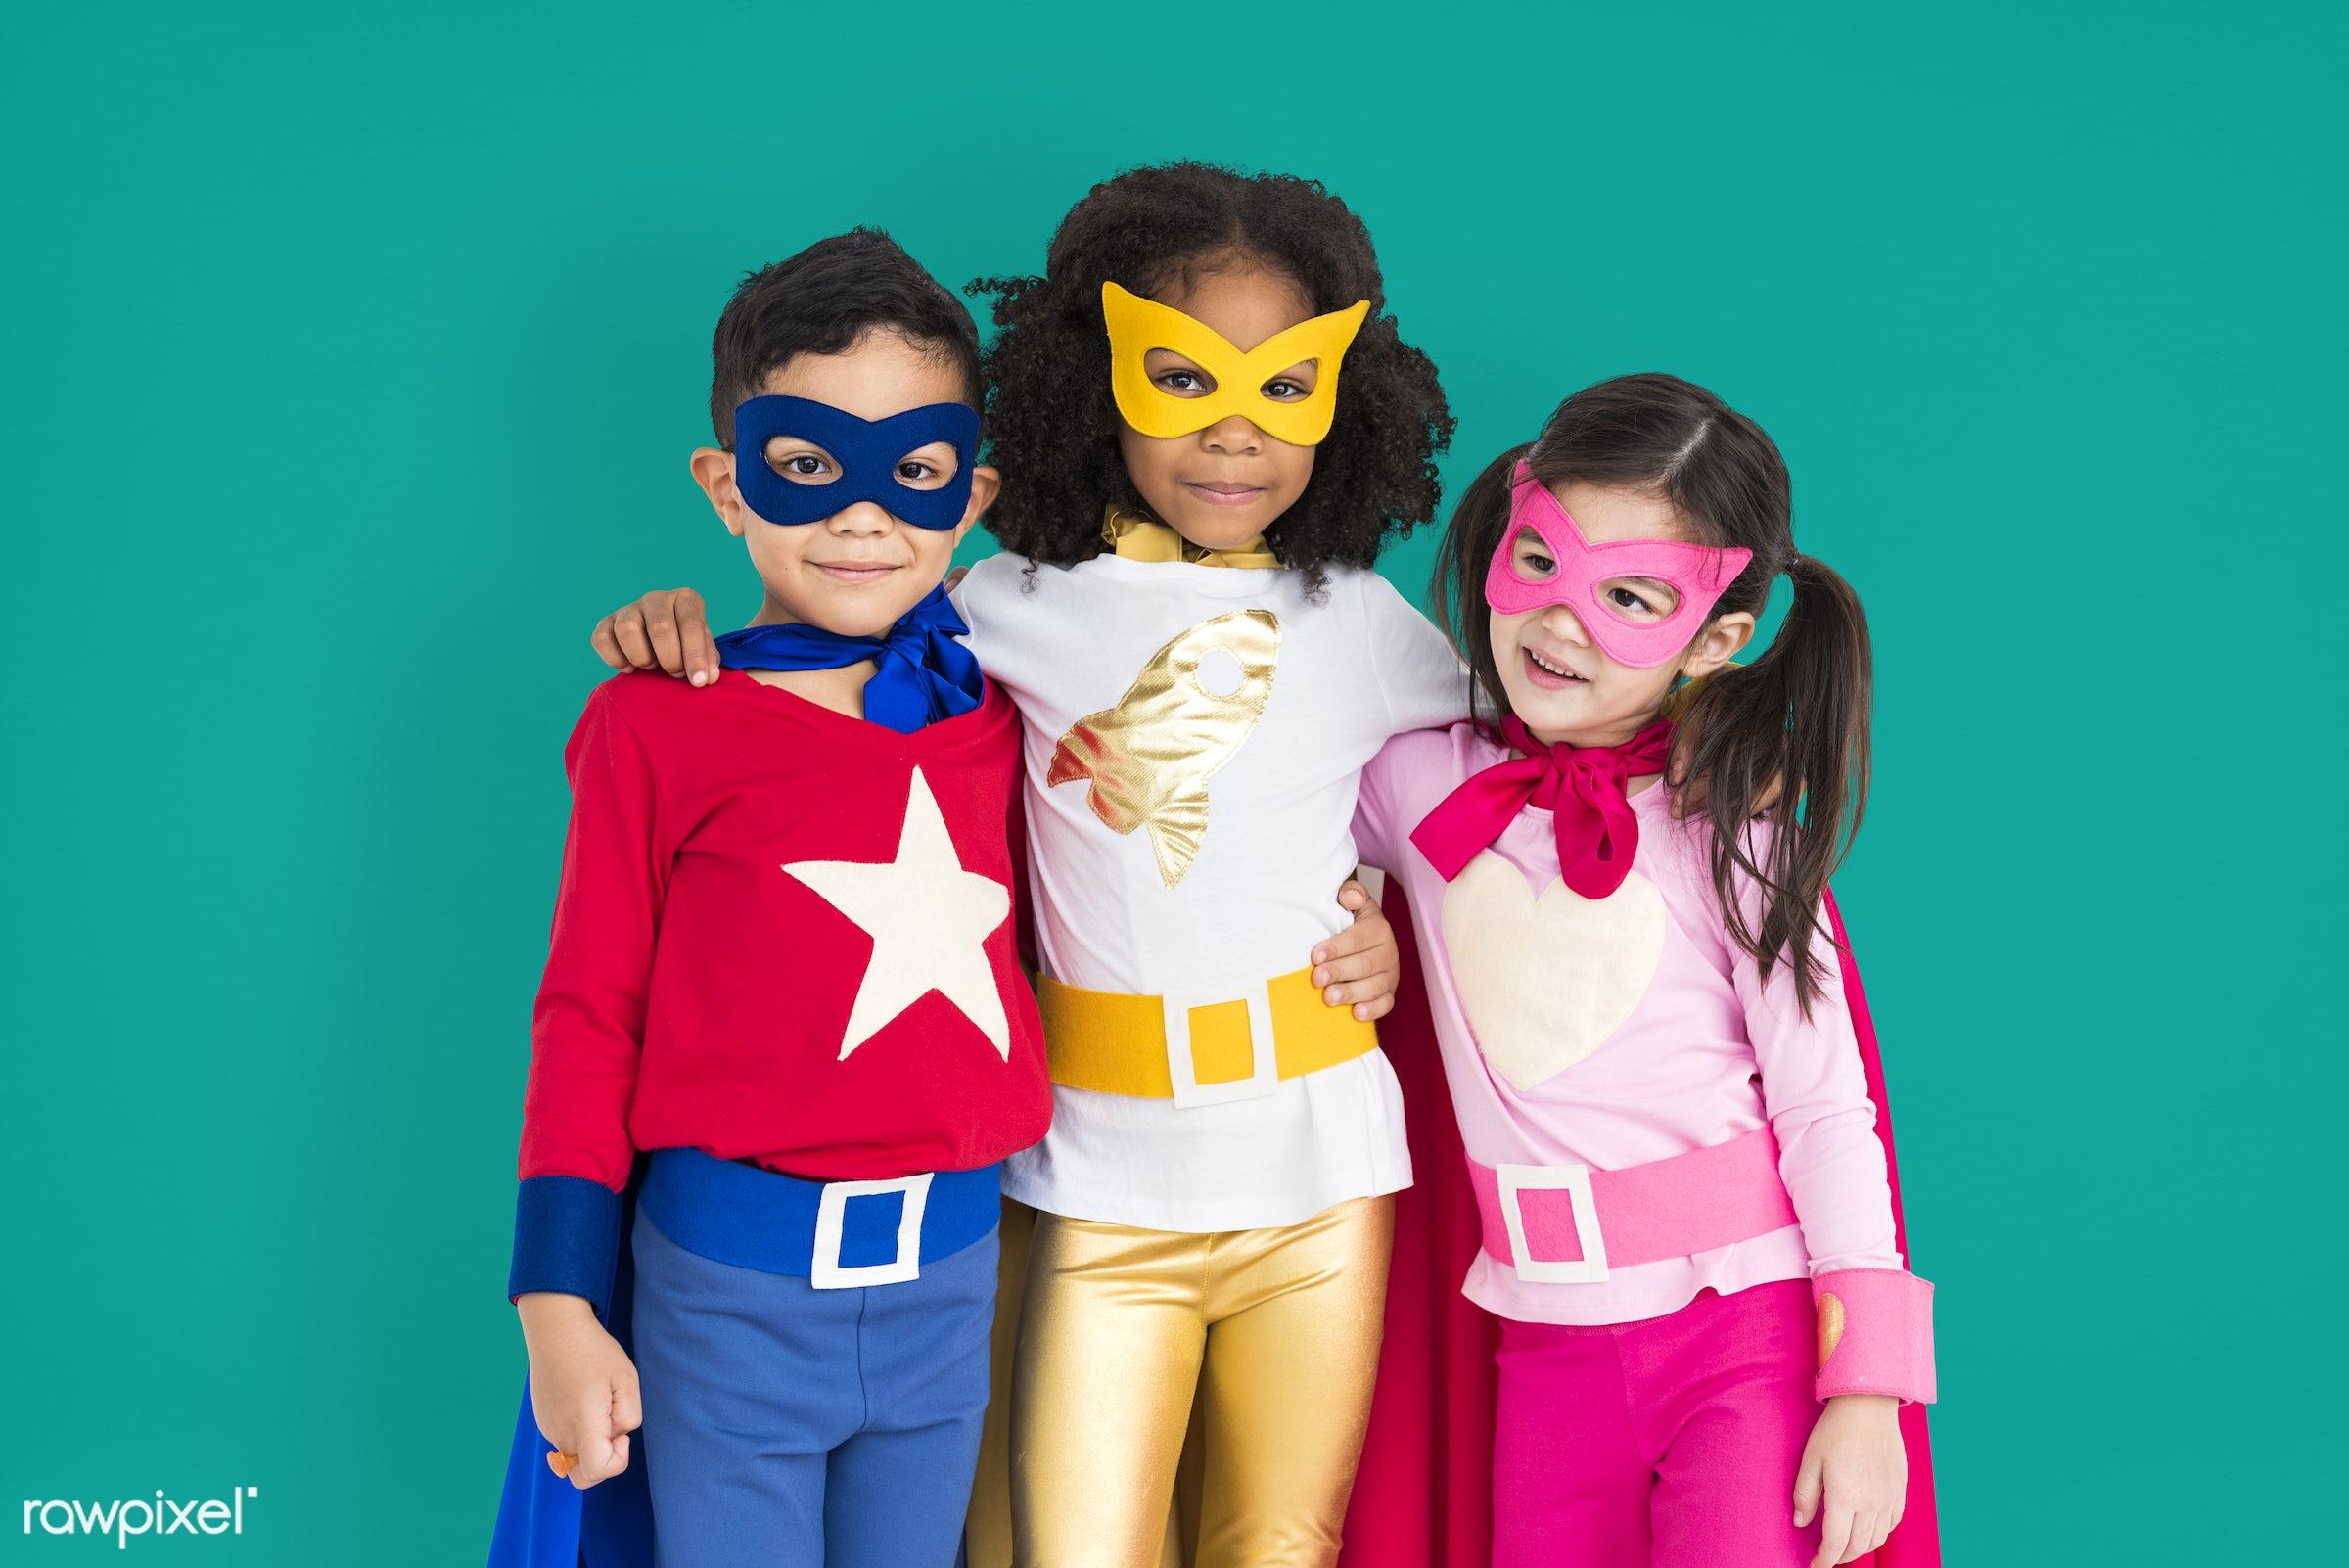 children, courageous, kid, adolescence, child, girl, inspiration, leader, idol, childhood, superhero, isolated, hero, green...